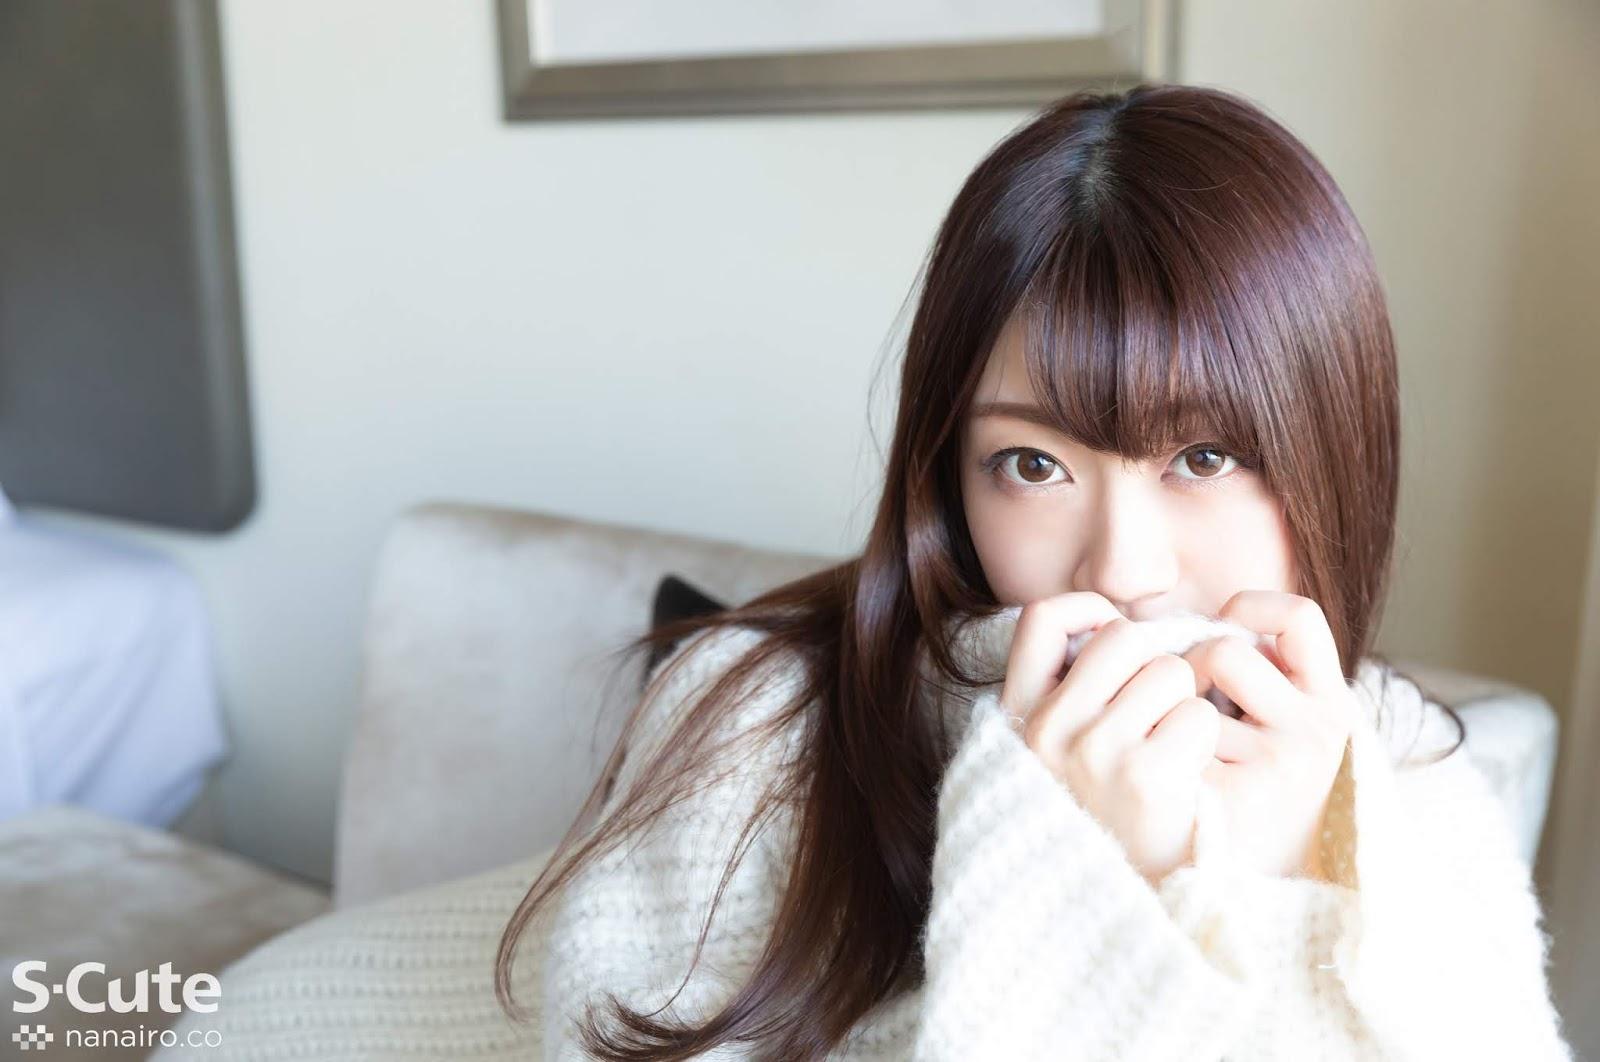 S-Cute 771_ichika_01 ぴちゃぴちゃ音がエロいハメ潮H/Ichika - idols